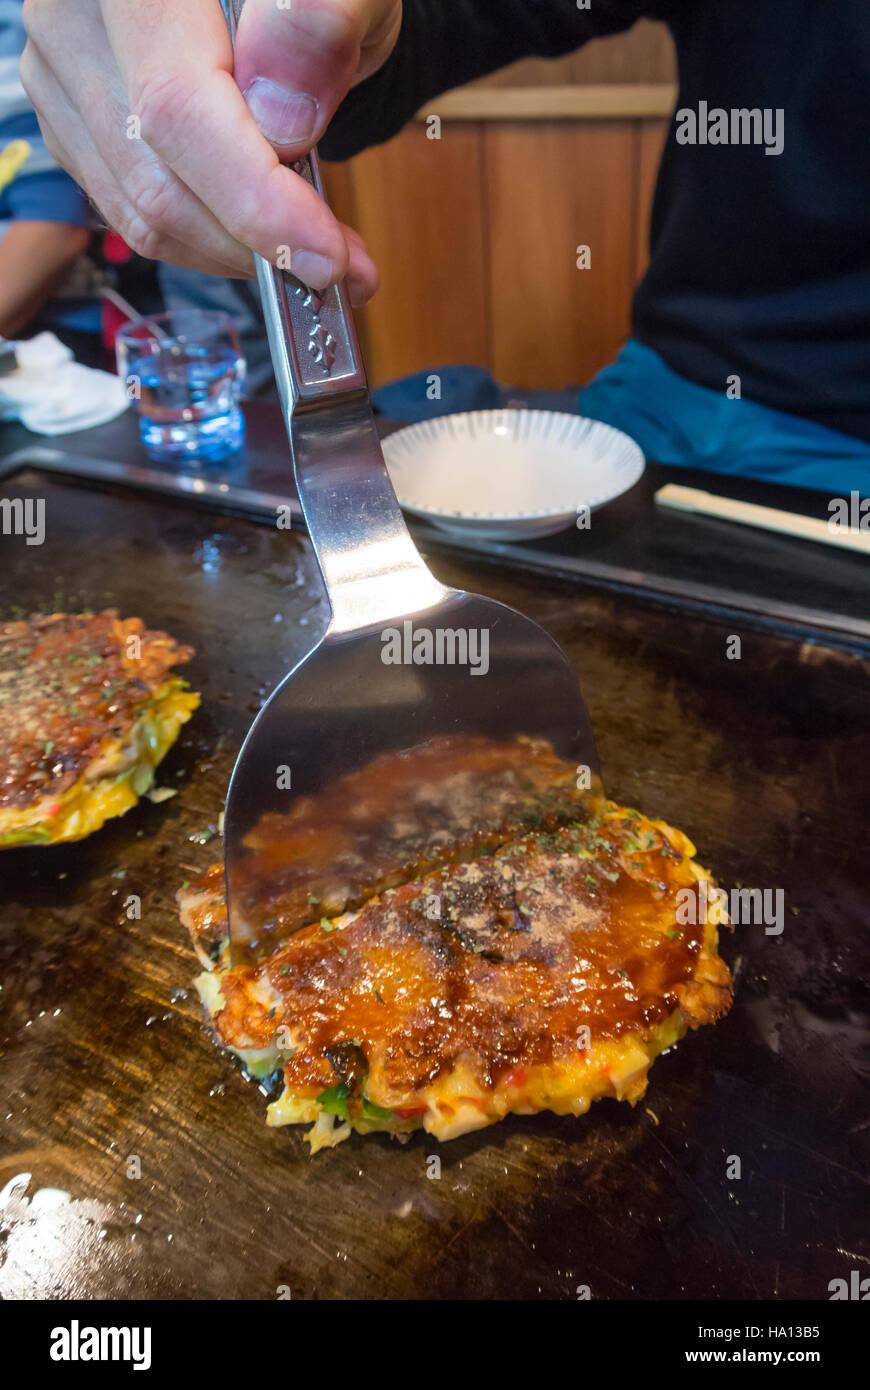 cutting Okonomiyaki, typical japanese dish, Japan - Stock Image